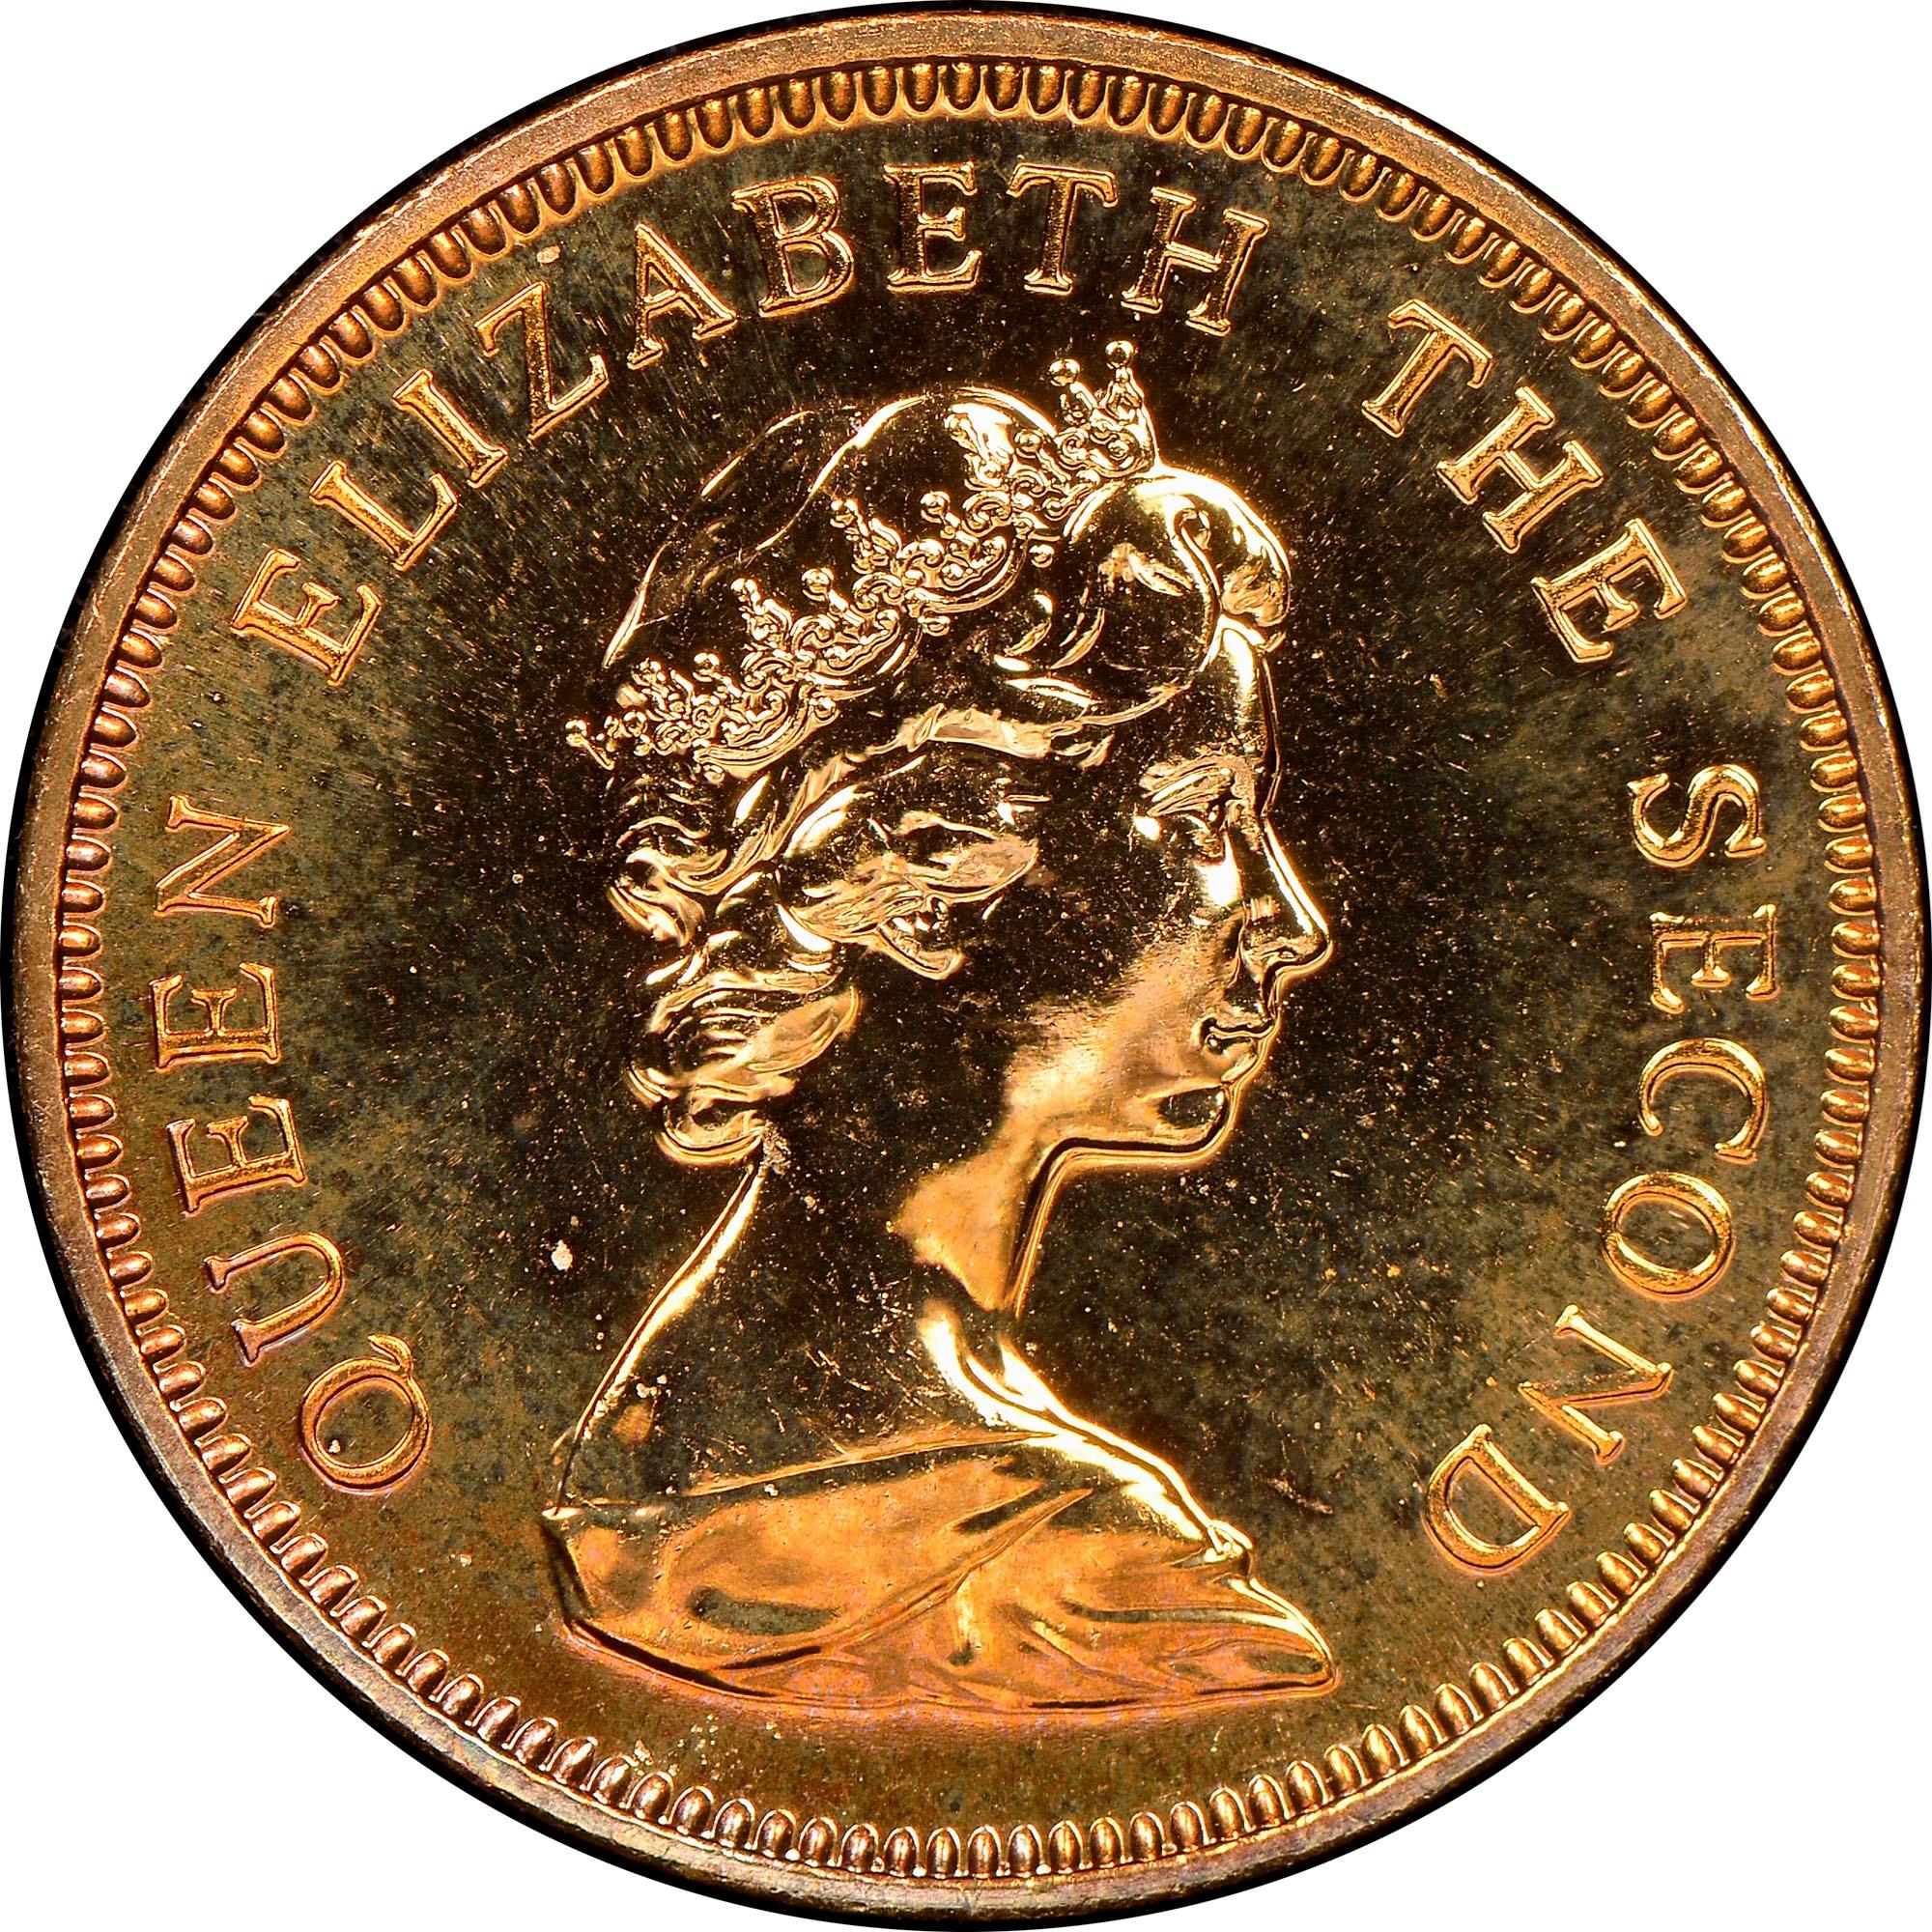 Falkland Islands Penny obverse